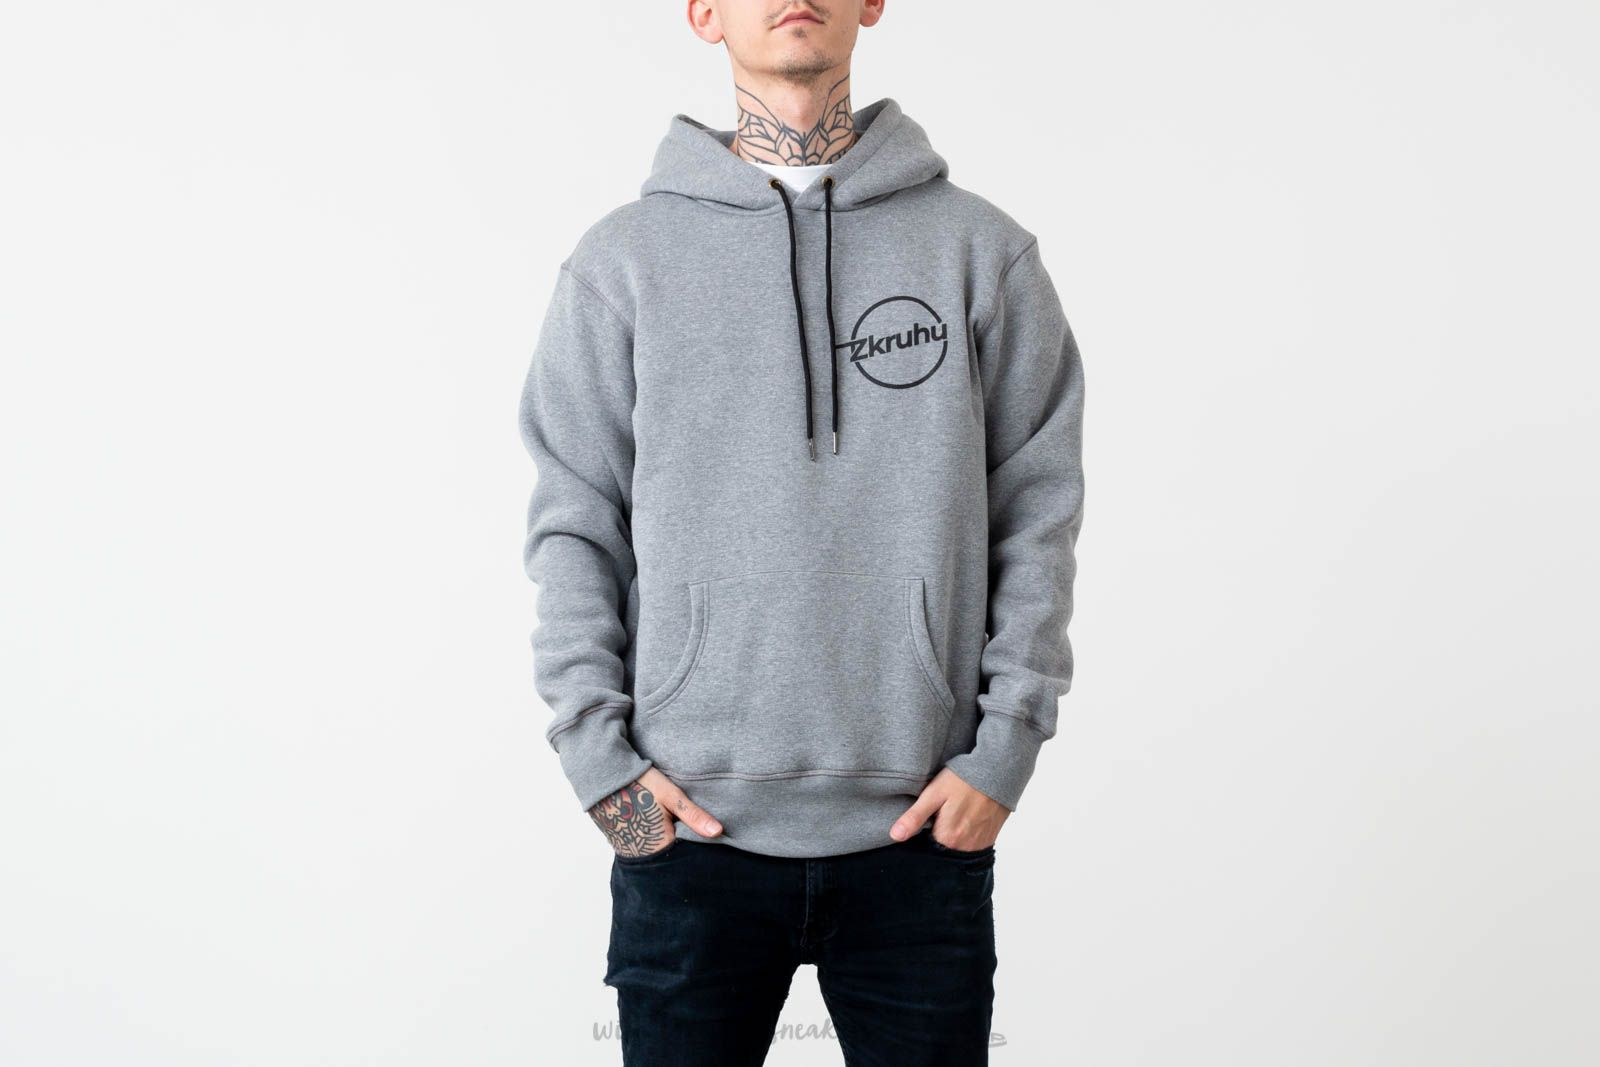 Zkruhu x FTSHP Hoodie Grey W super cenie 219 zł kupuj na Footshop.pl